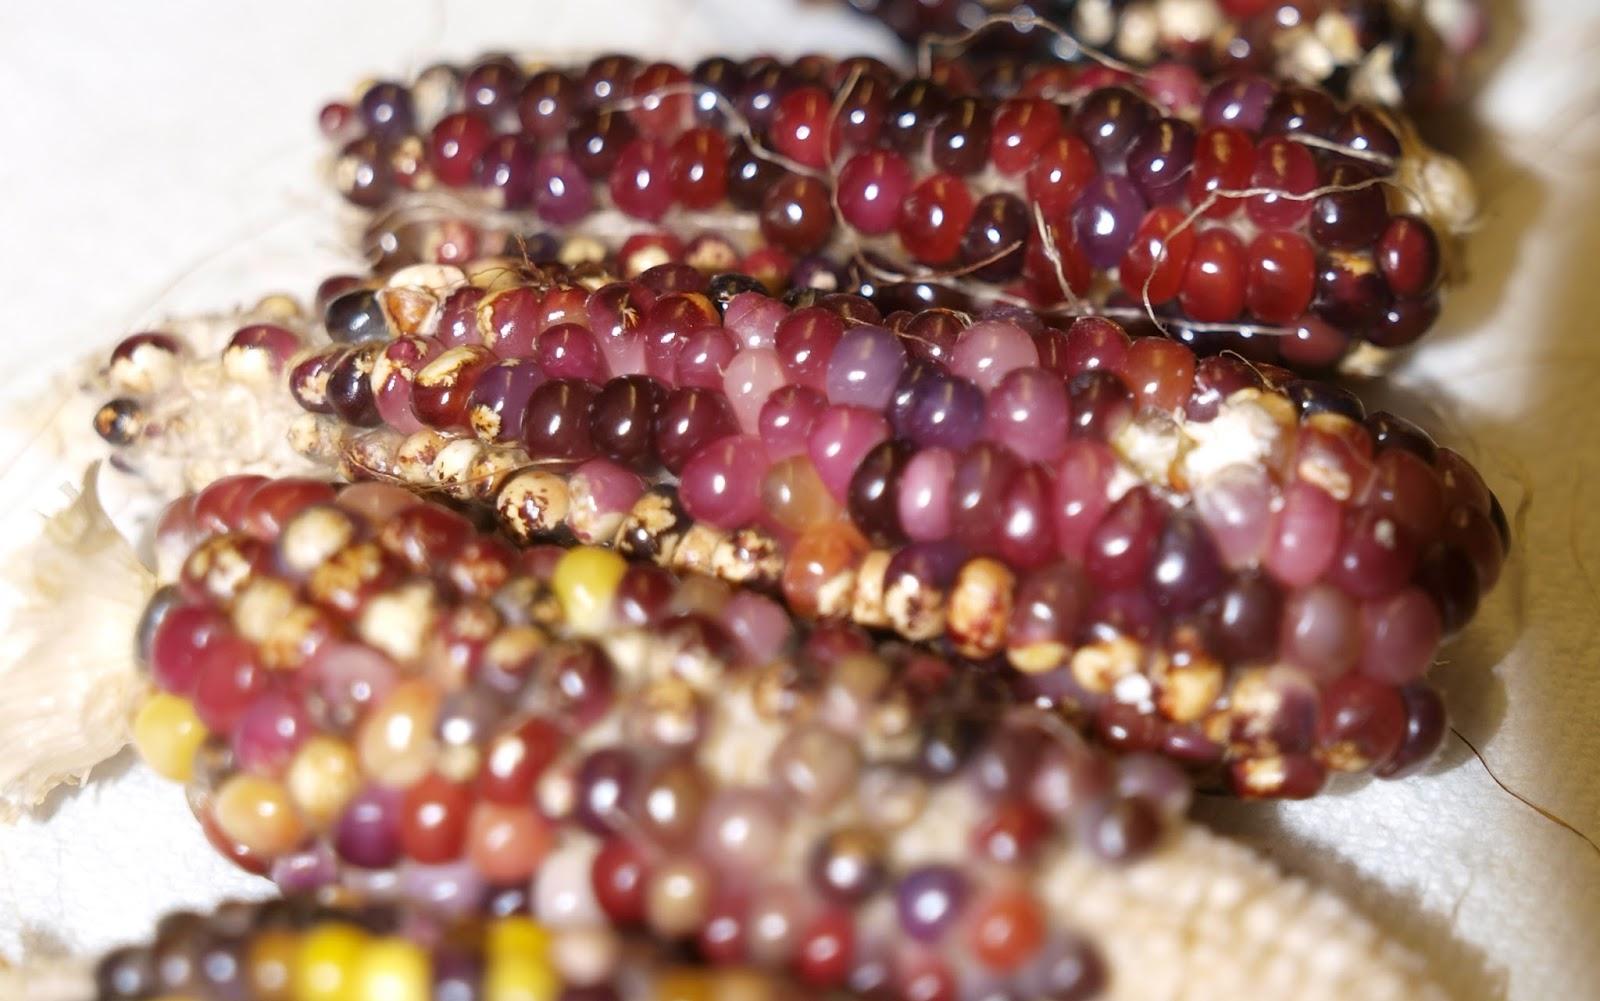 Hopi Glass Corn flint corn with kernels like beads of glass